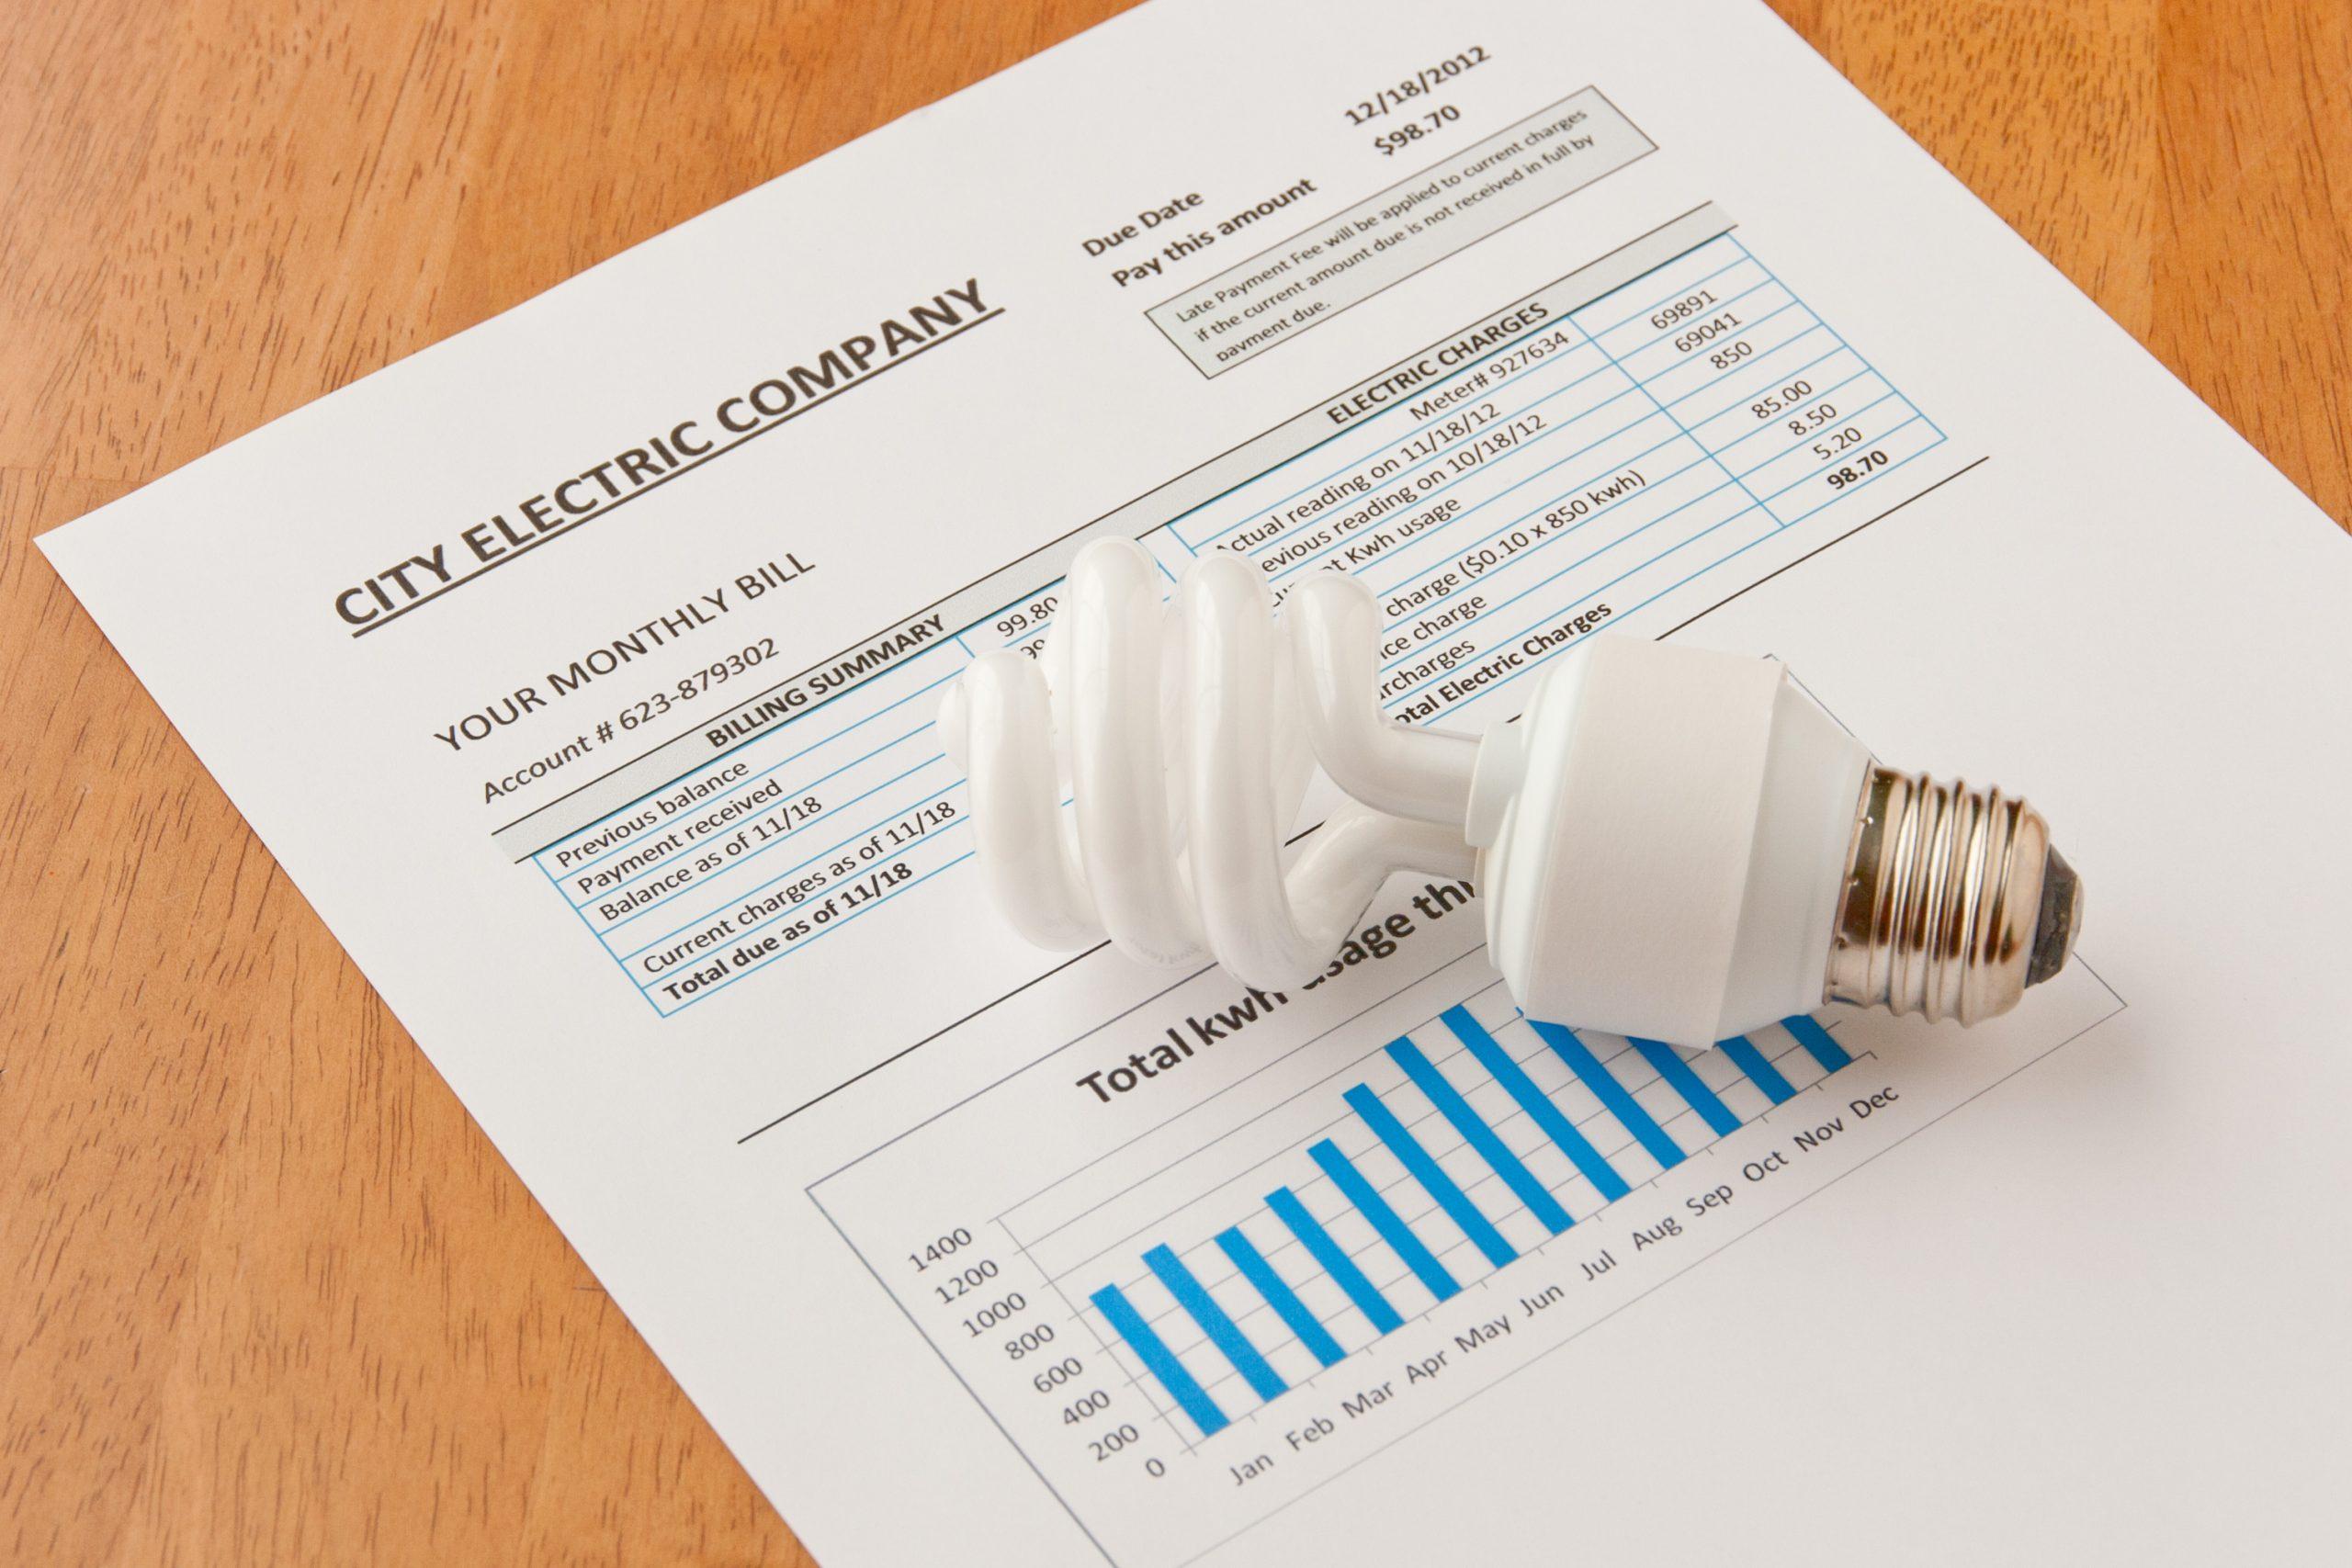 lightbulb on electric plans bill